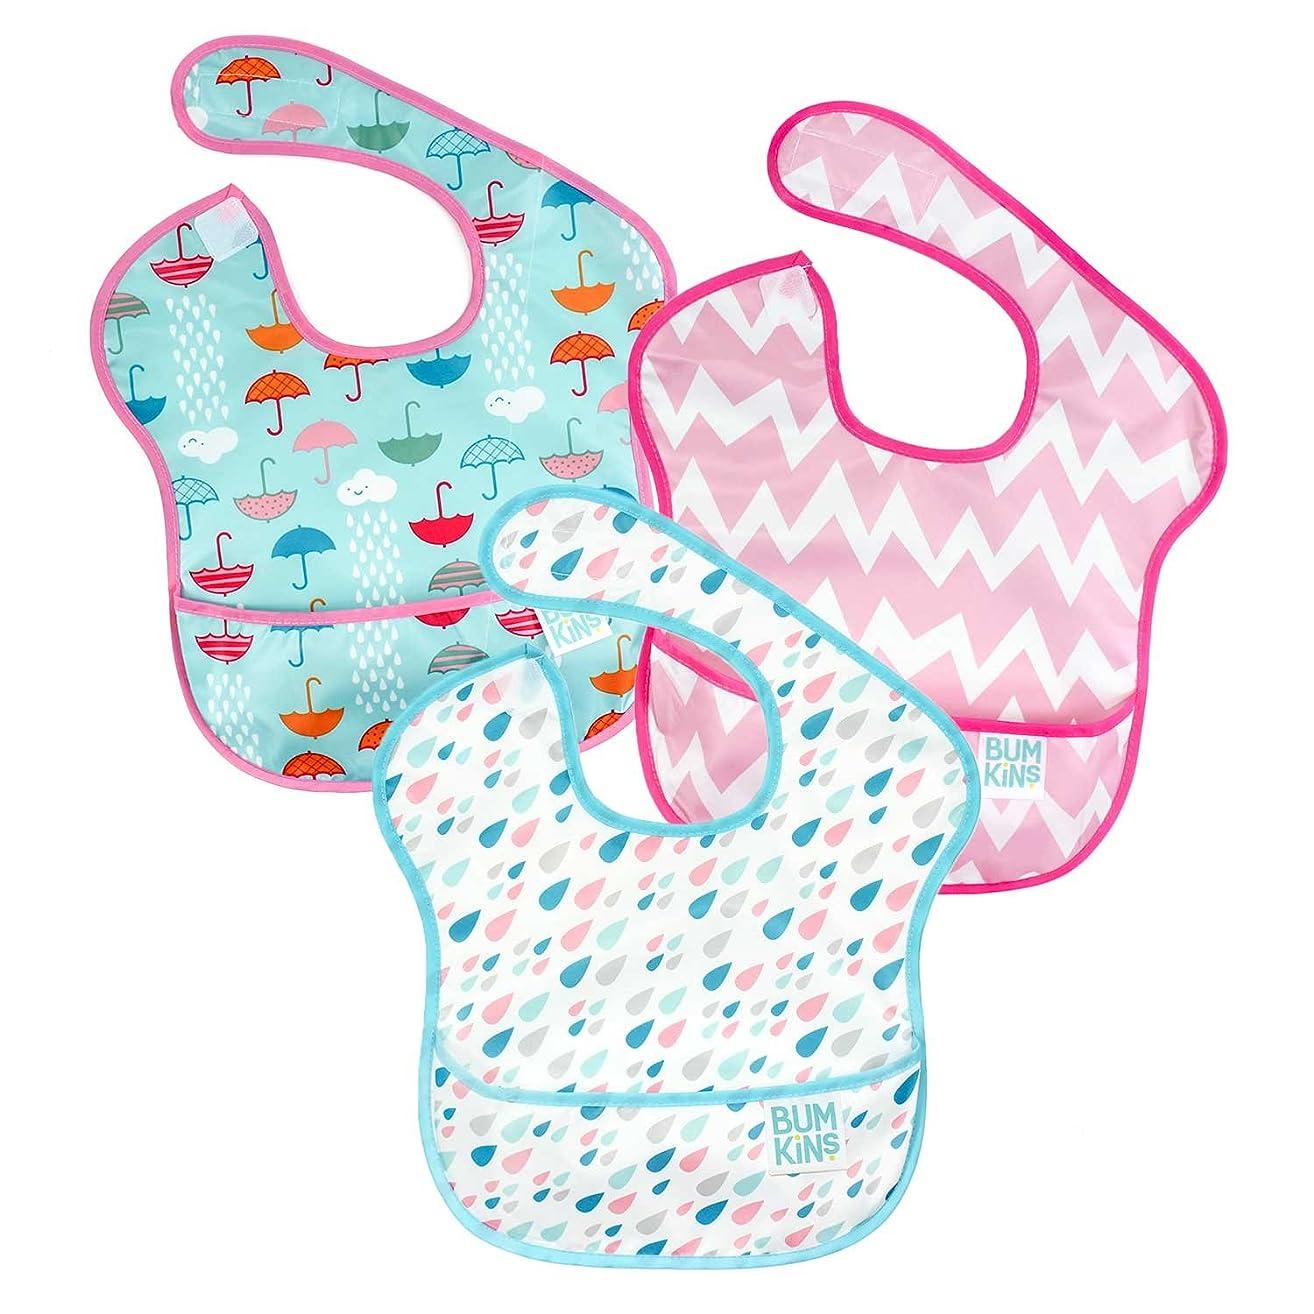 Bumkins SuperBib, Baby Bib, Waterproof, Washable, Stain and Odor Resistant, 6-24 Months, 3-Pack - Umbrellas, Raindrops, Pink Chevron